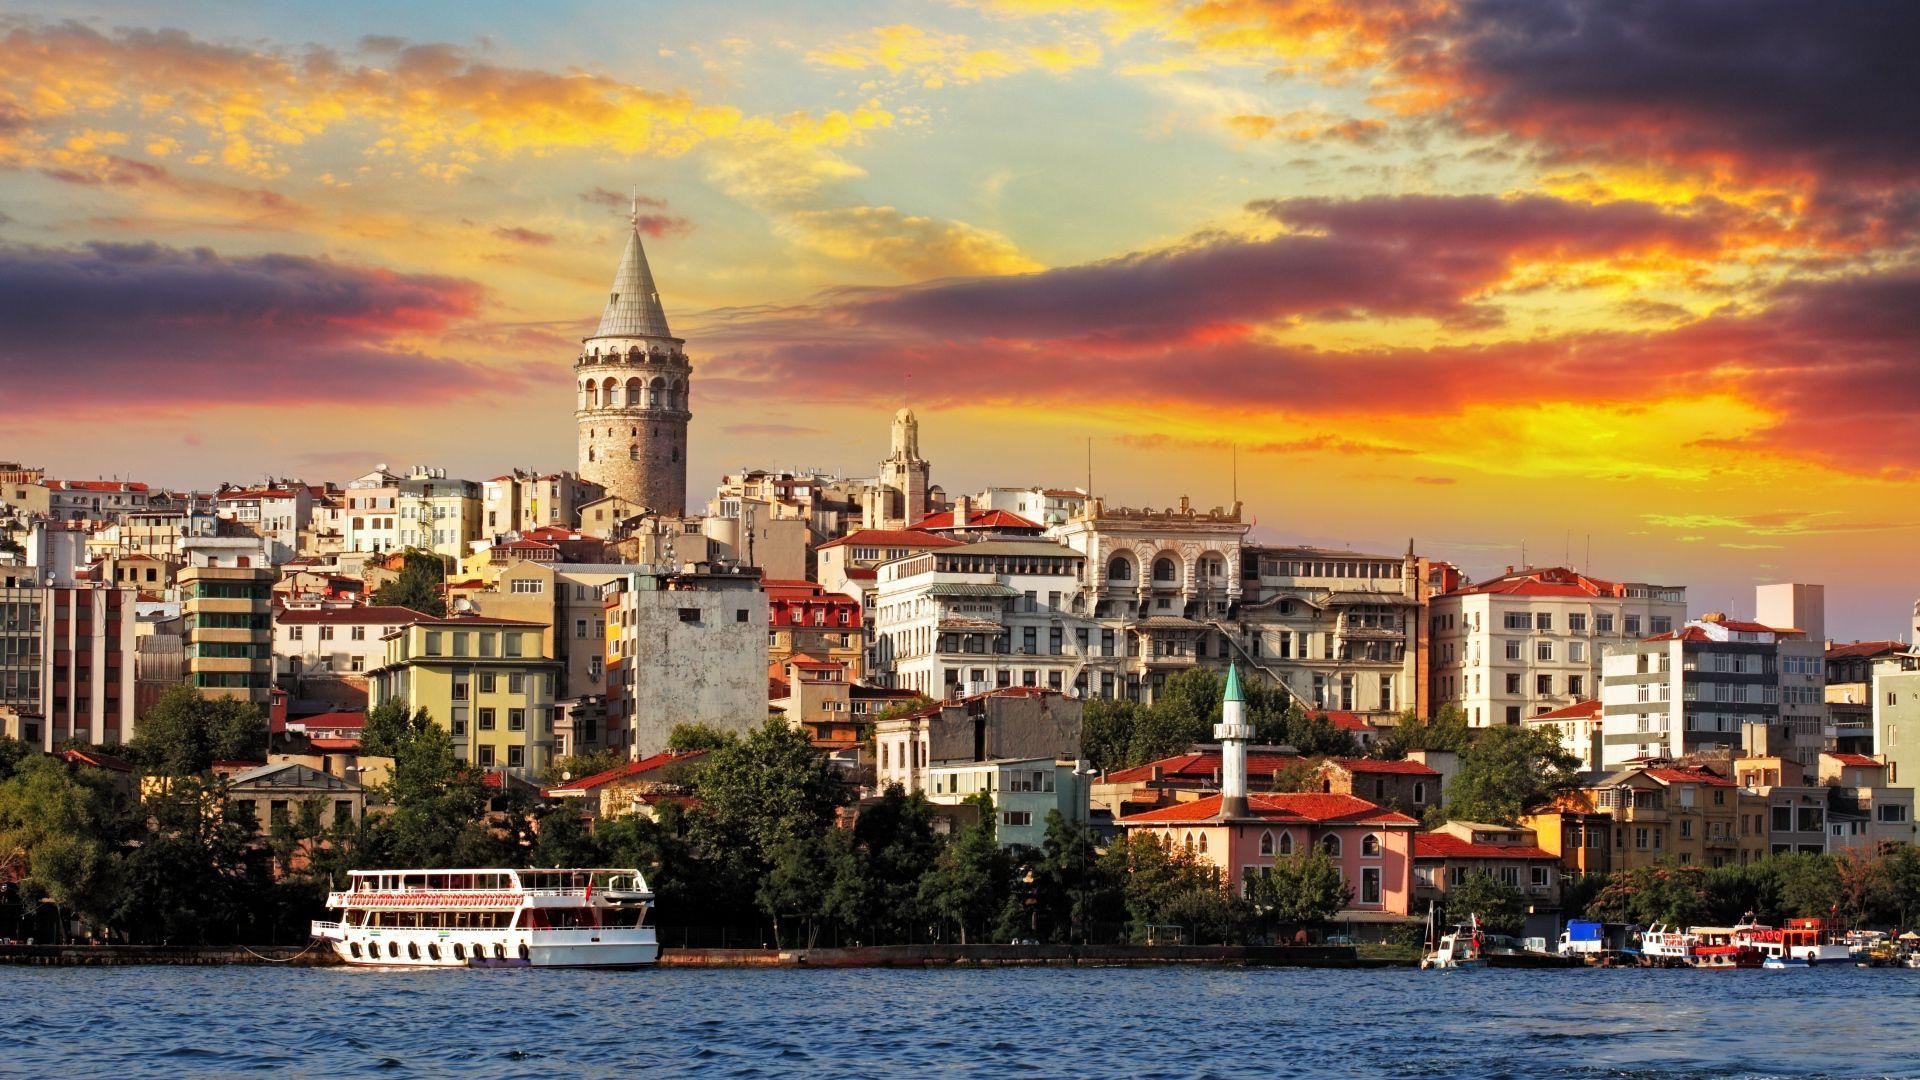 istanbul wallpaper 4k